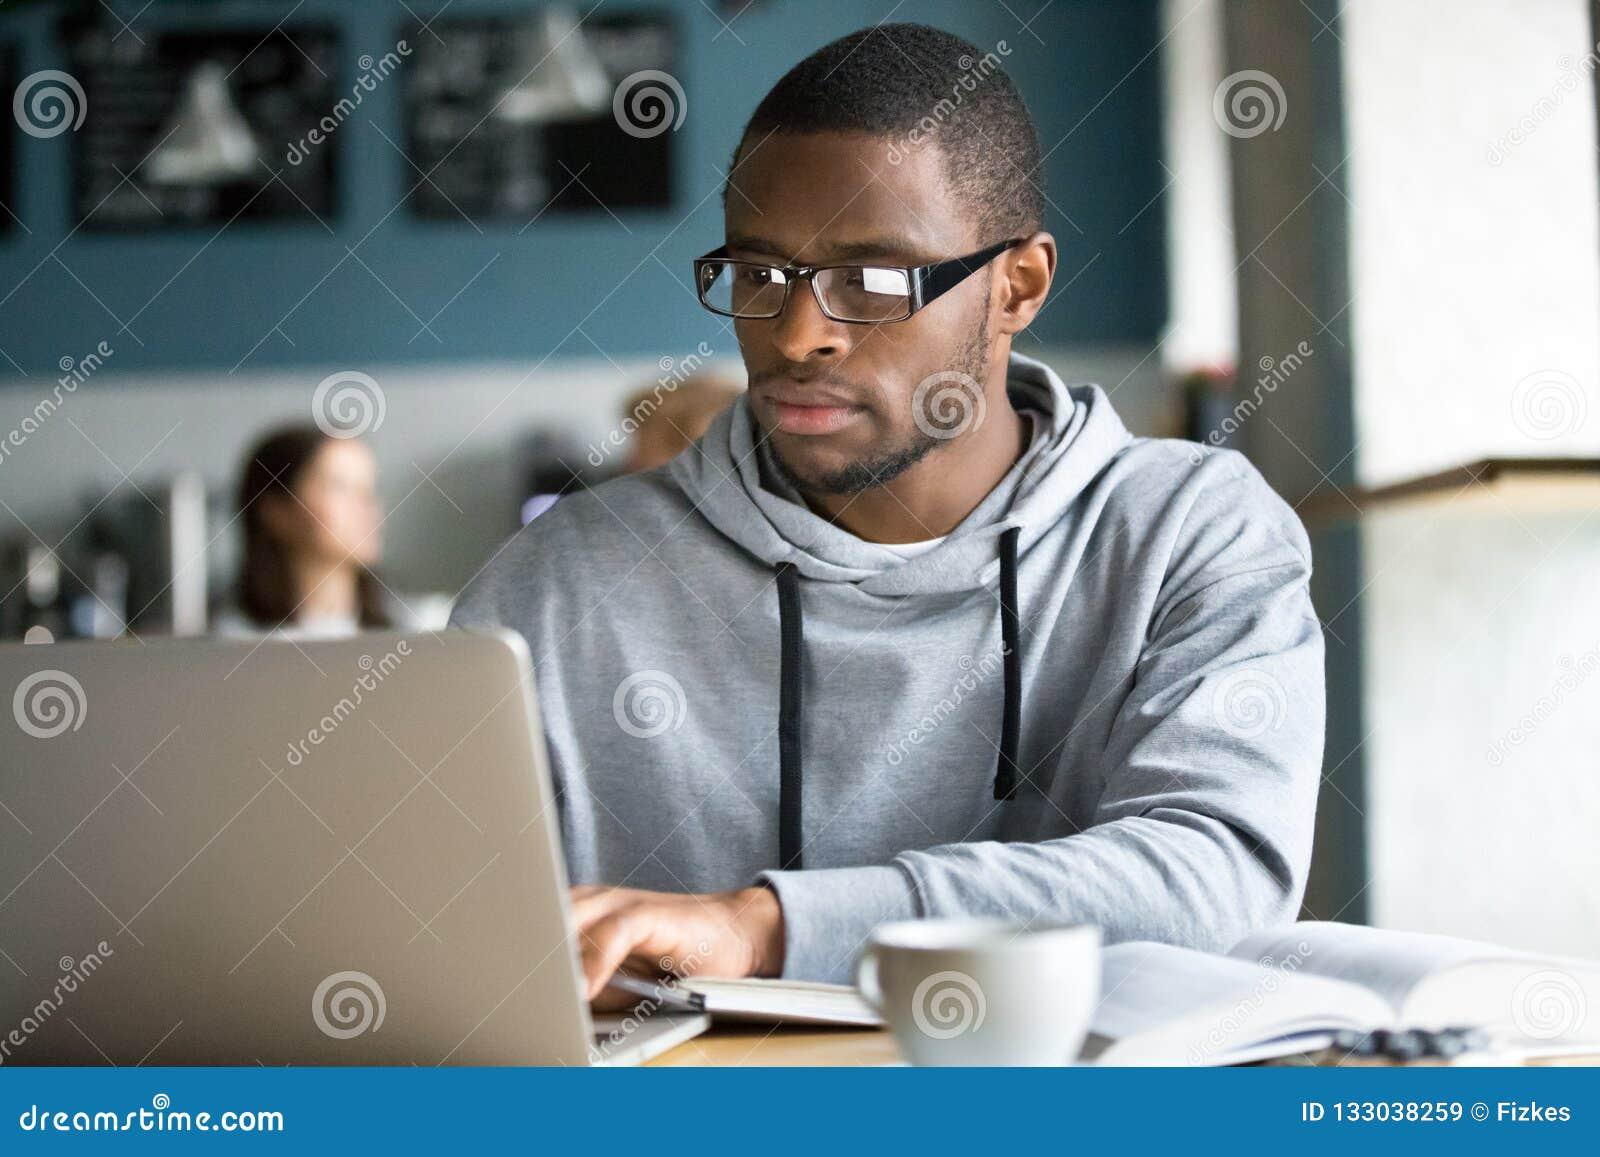 Focused black student studying online in coffeeshop